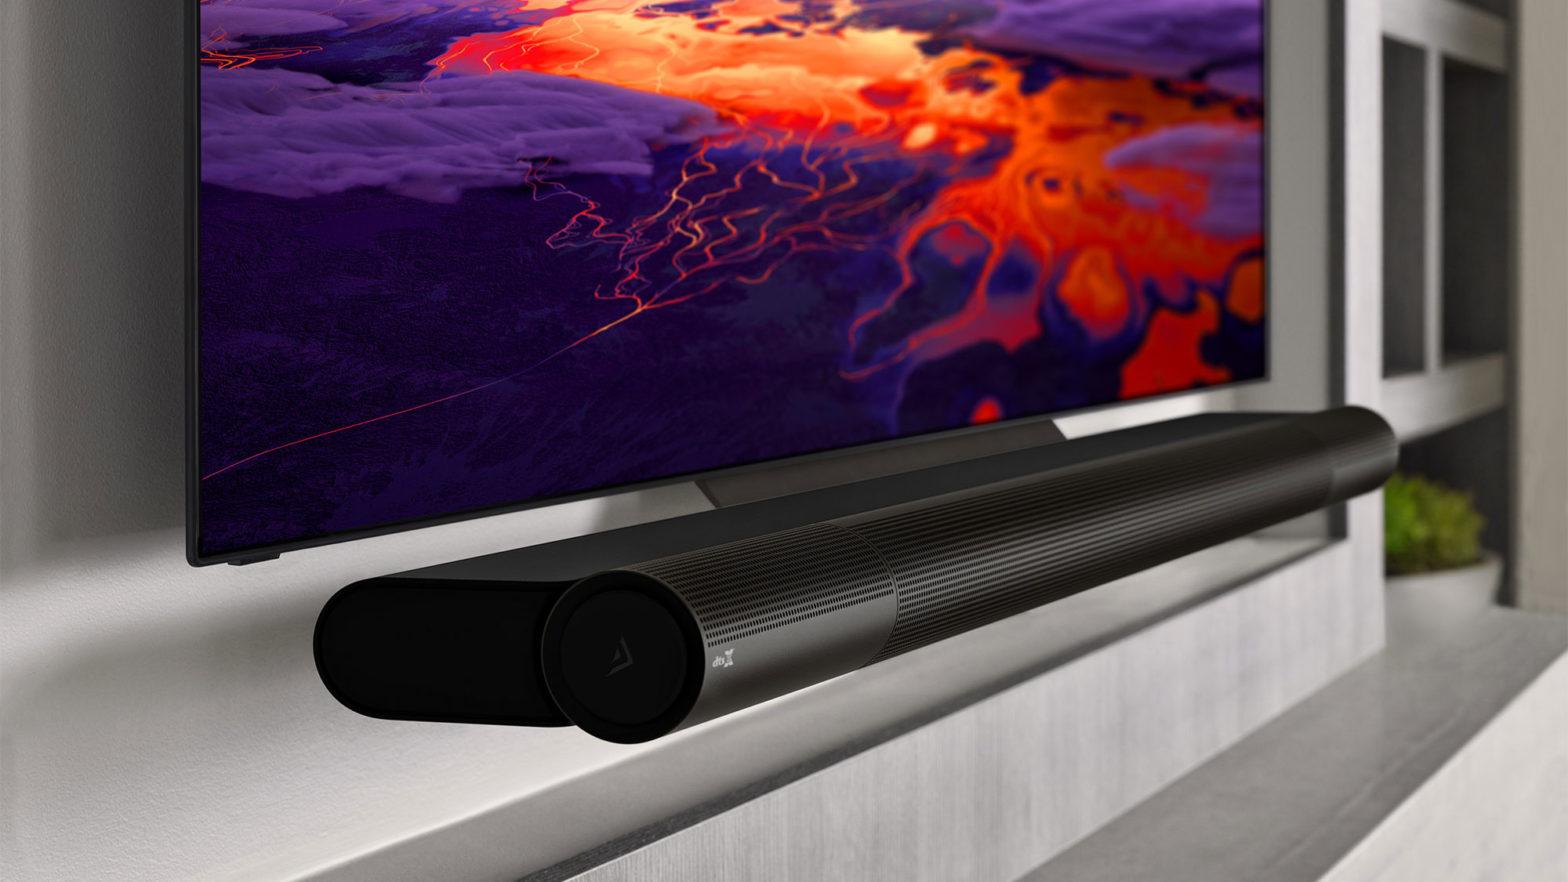 Vizio OLED 4K HDR Smart TV and Elevate Soundbar